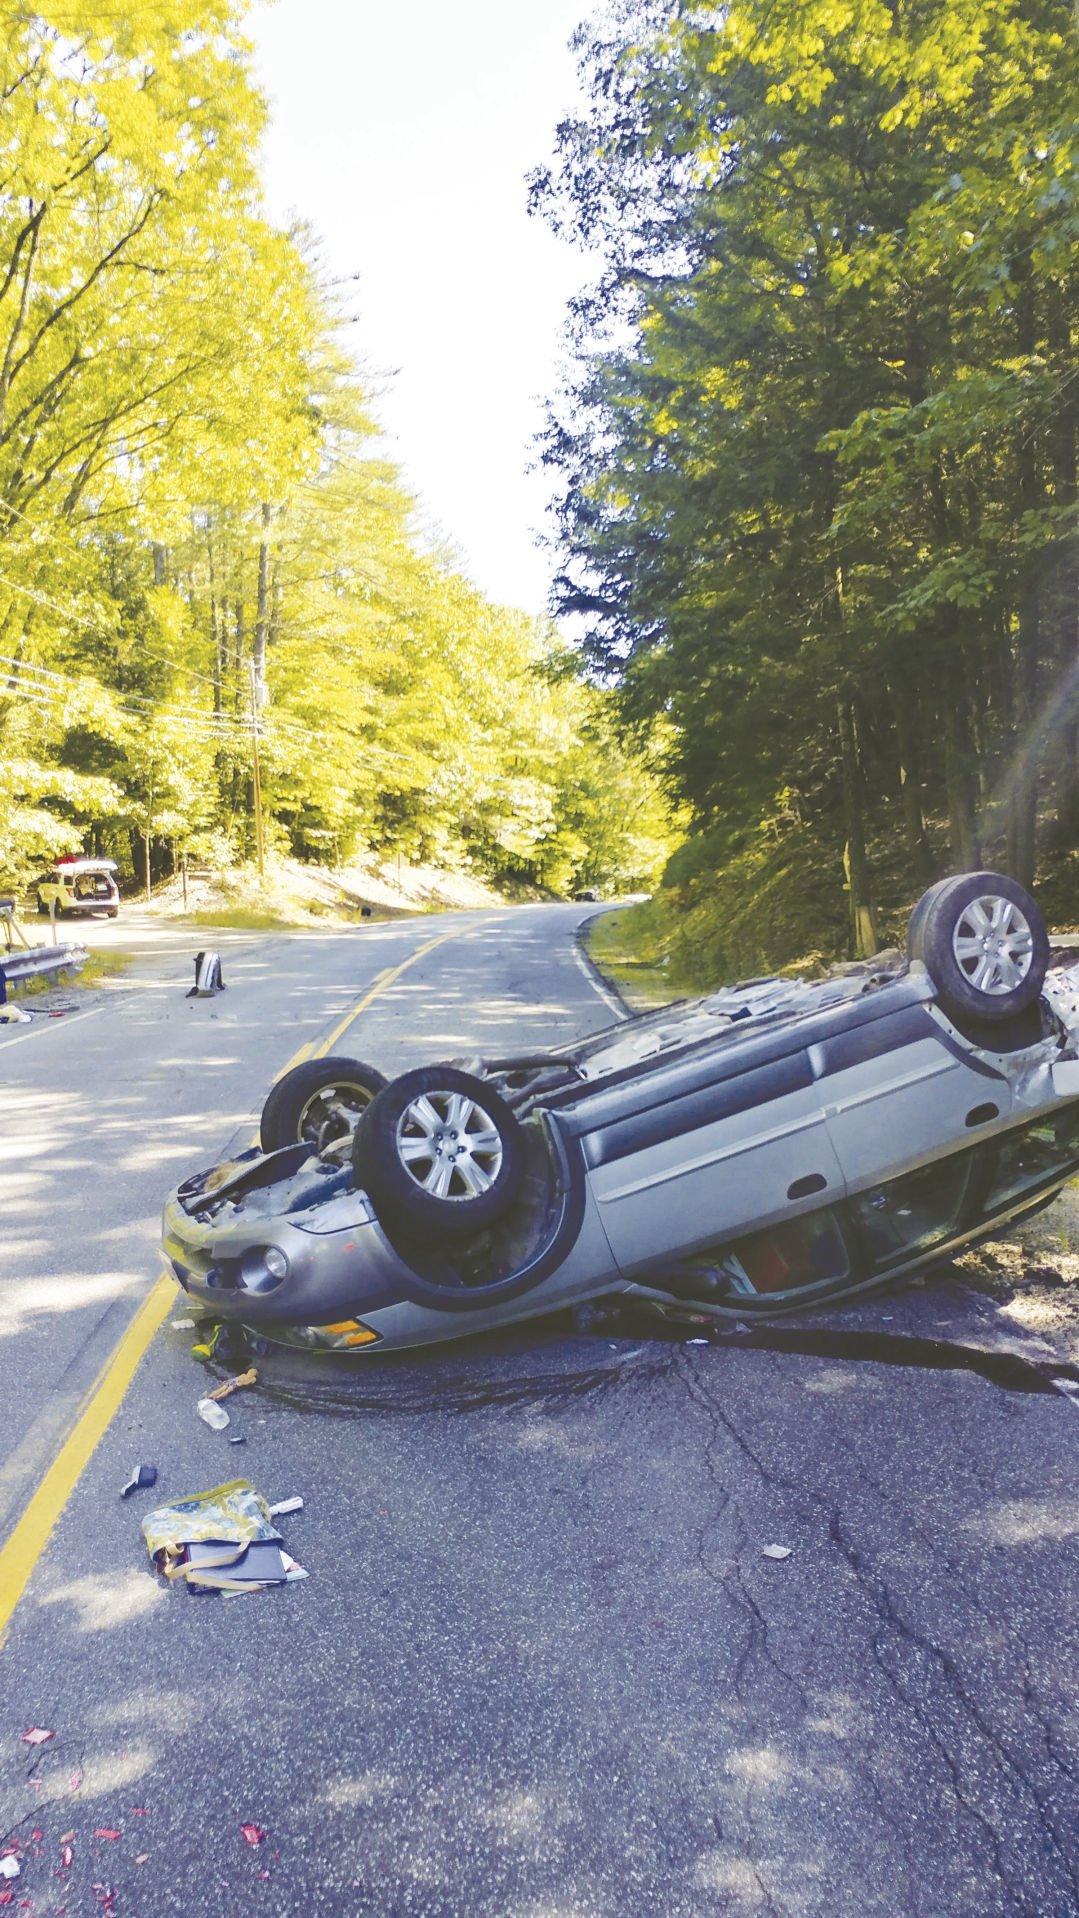 Mom, son stable/fair after Fryeburg crash | Local News